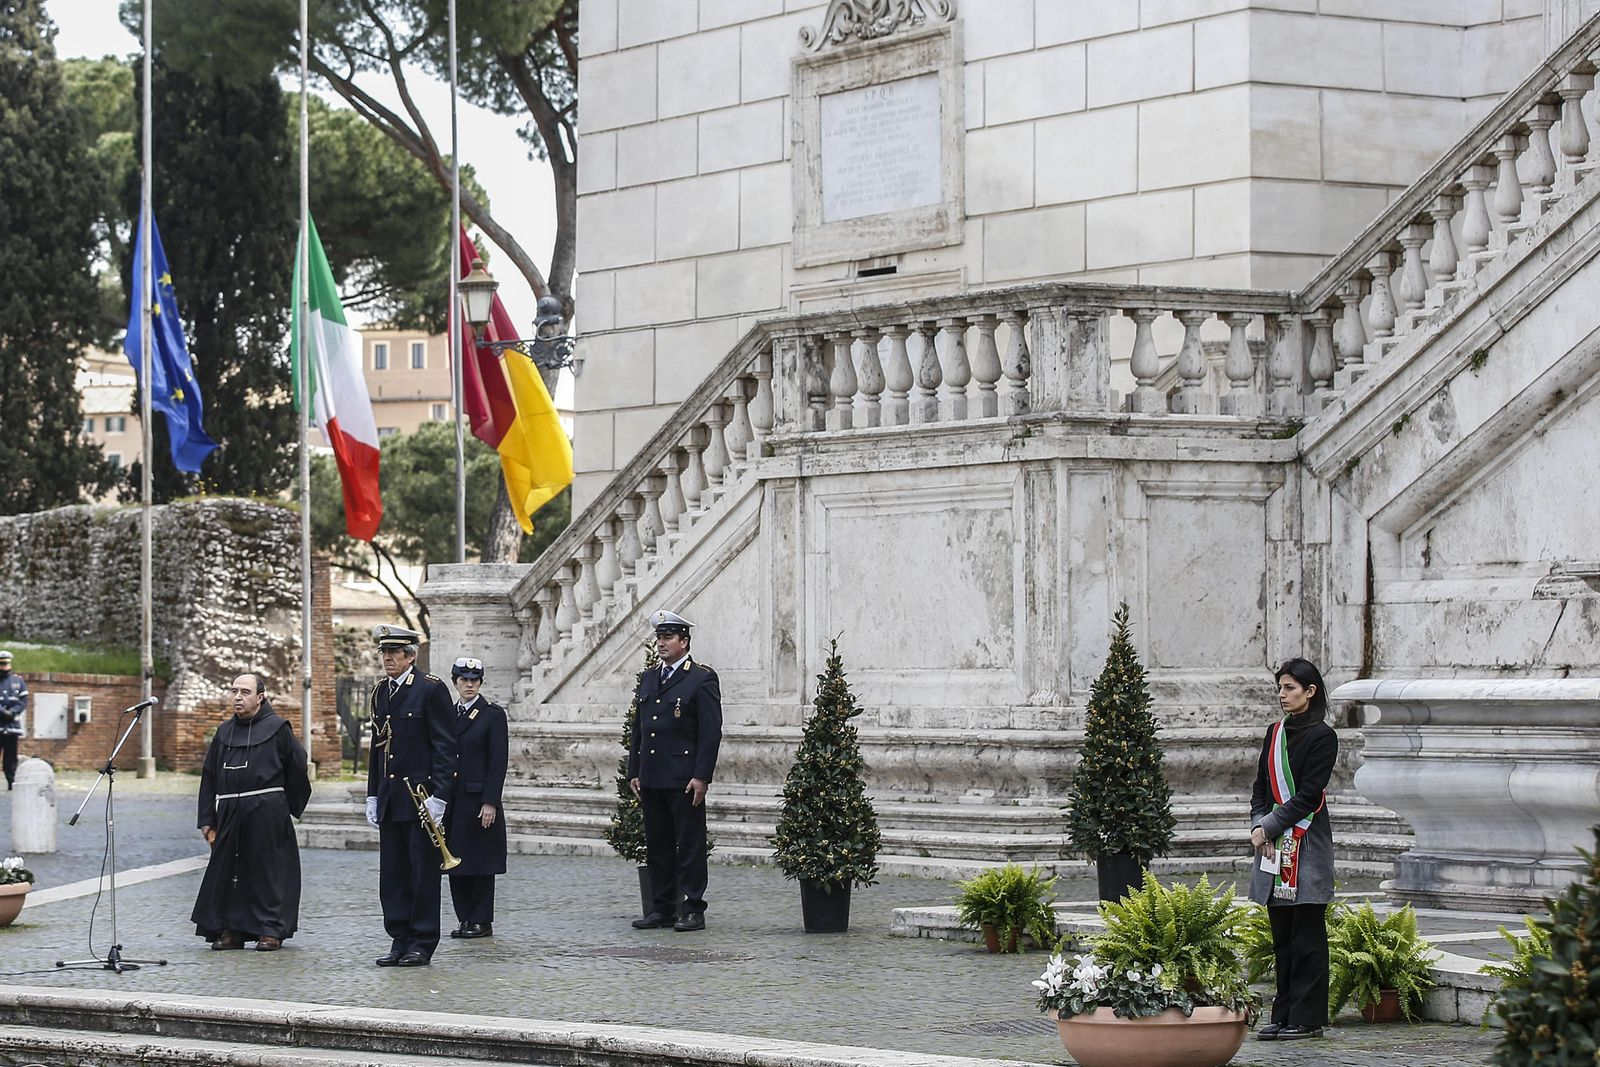 Coronavirus in Rome, Italy - 31 Mar 2020